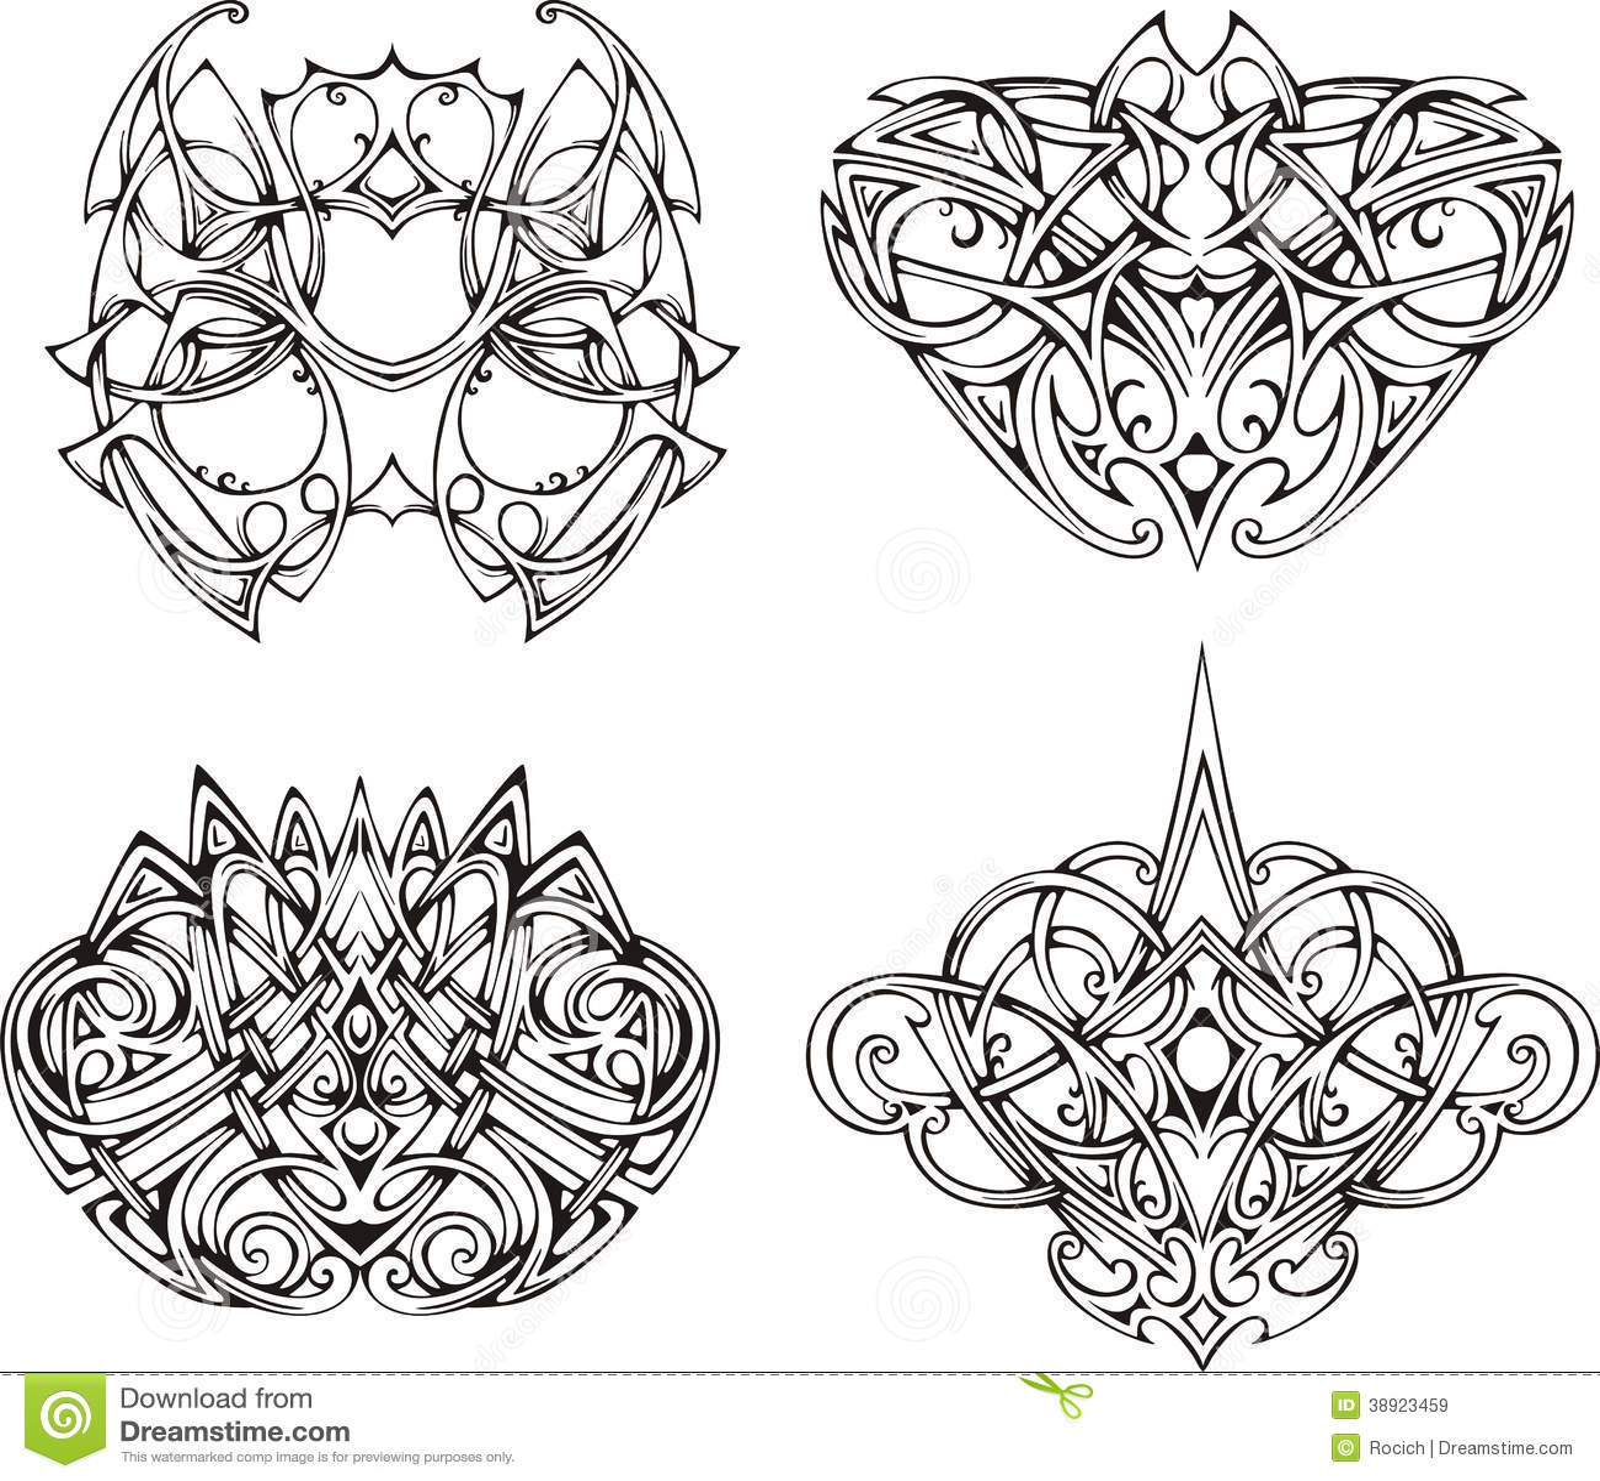 symmetrical knot tattoo designs stock illustration illustration of illustration black 38923459. Black Bedroom Furniture Sets. Home Design Ideas